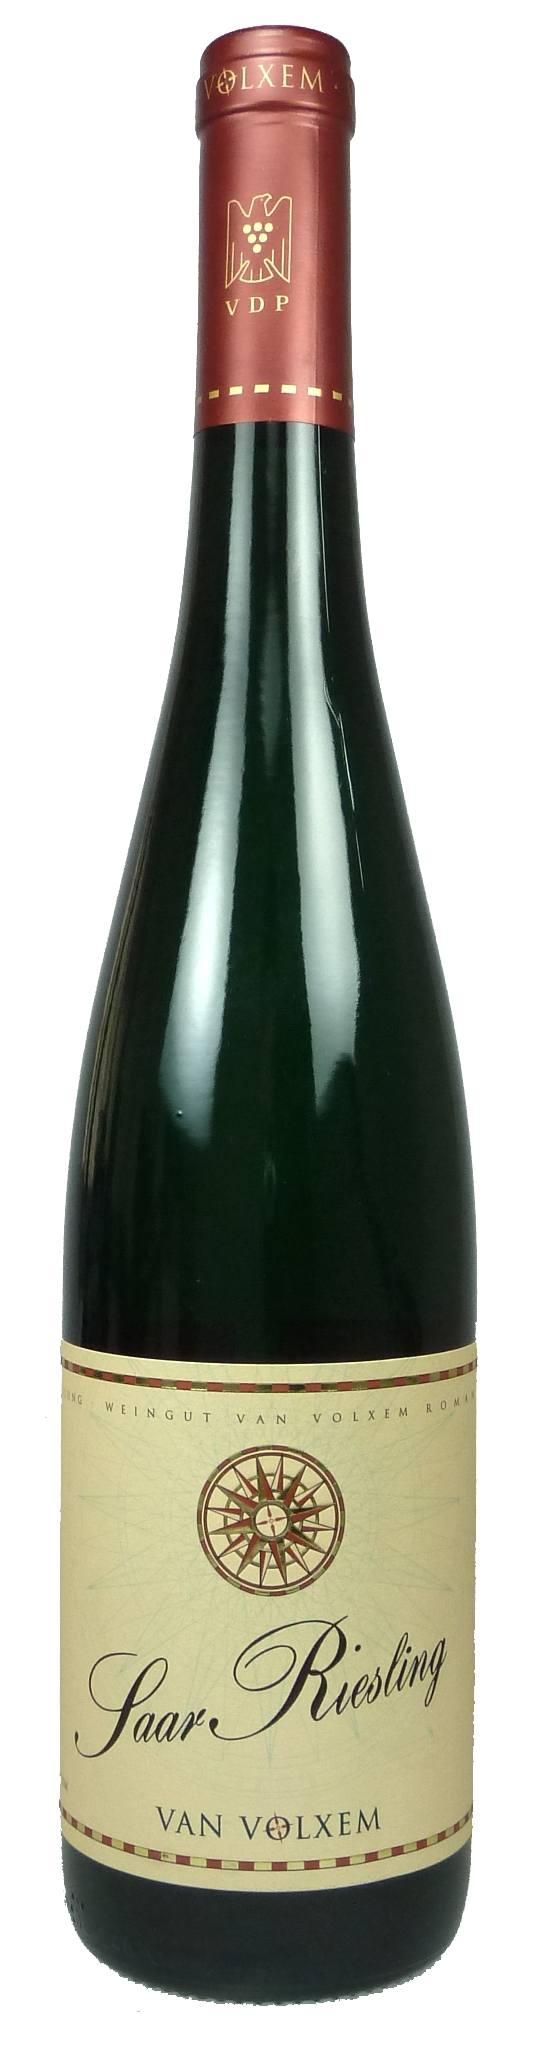 Saar Riesling Qualitätswein trocken 2016